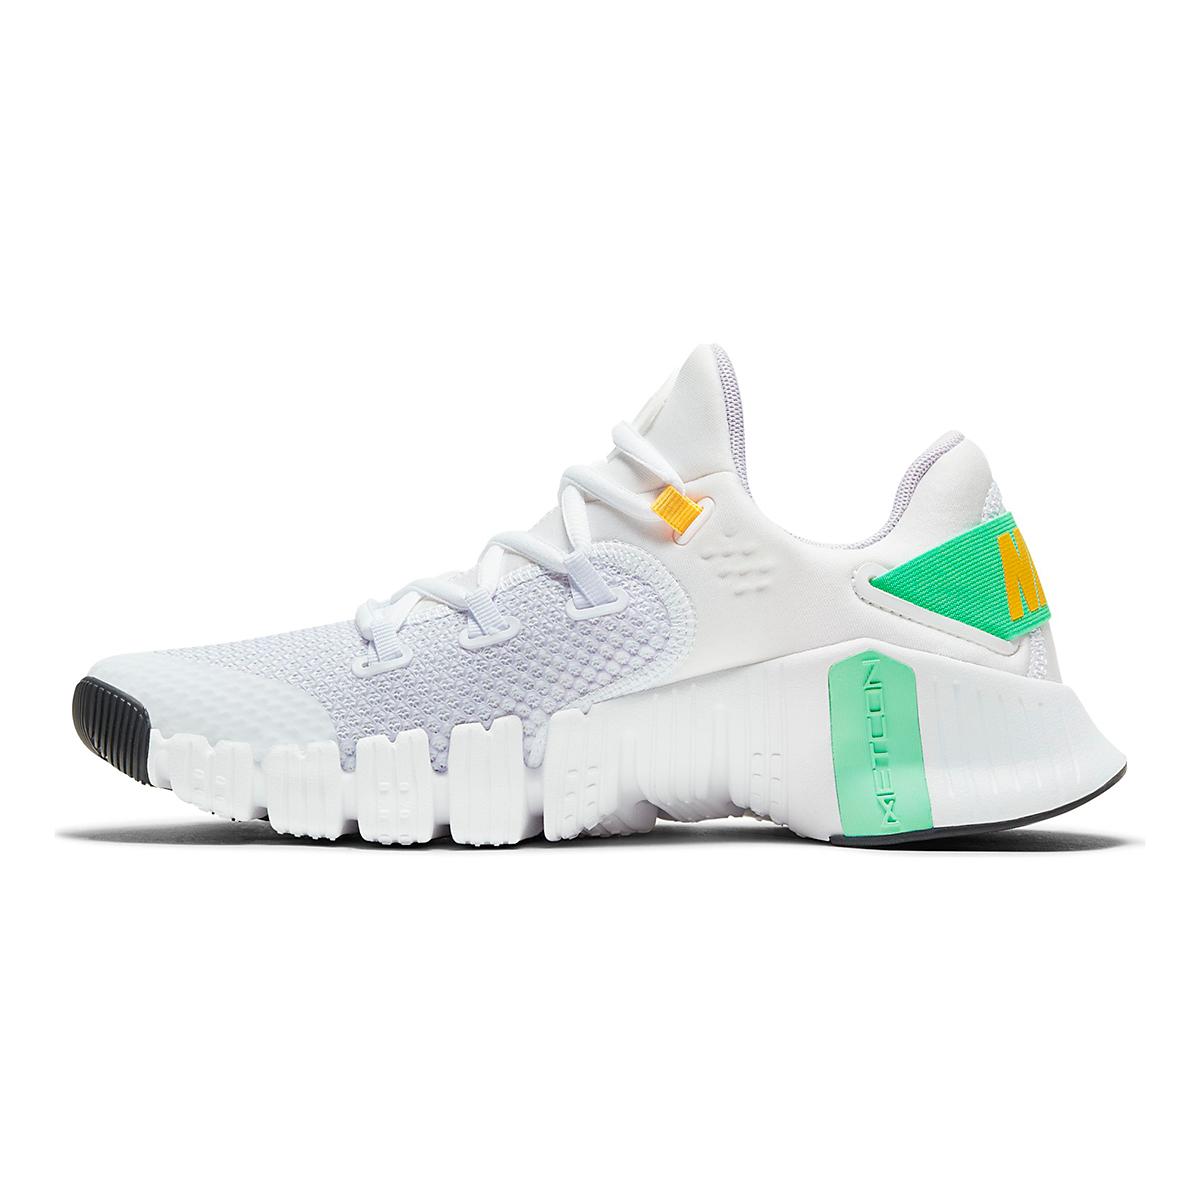 Women's Nike Free Metcon 4 Training Shoe - Color: White/Infinite Lilac/Smoke Grey - Size: 5 - Width: Regular, White/Infinite Lilac/Smoke Grey, large, image 2